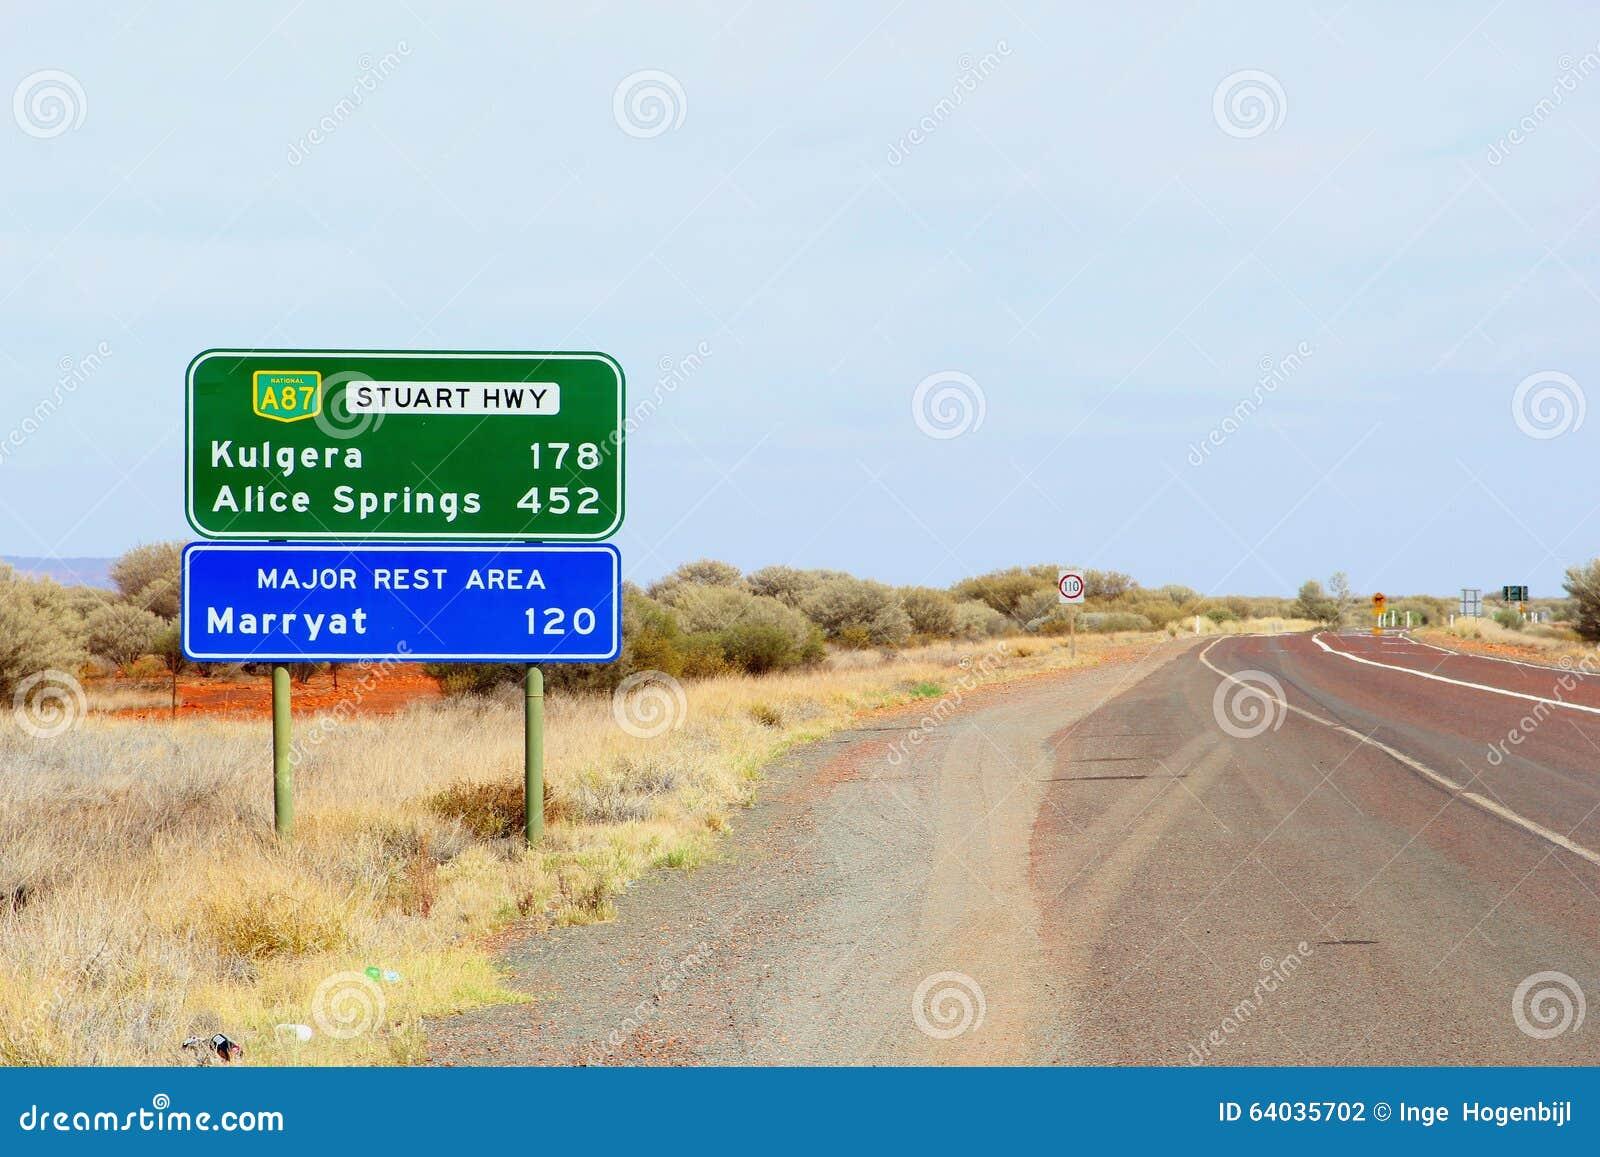 Kierunkowskaz Kulgera i Alice Springs, Australia